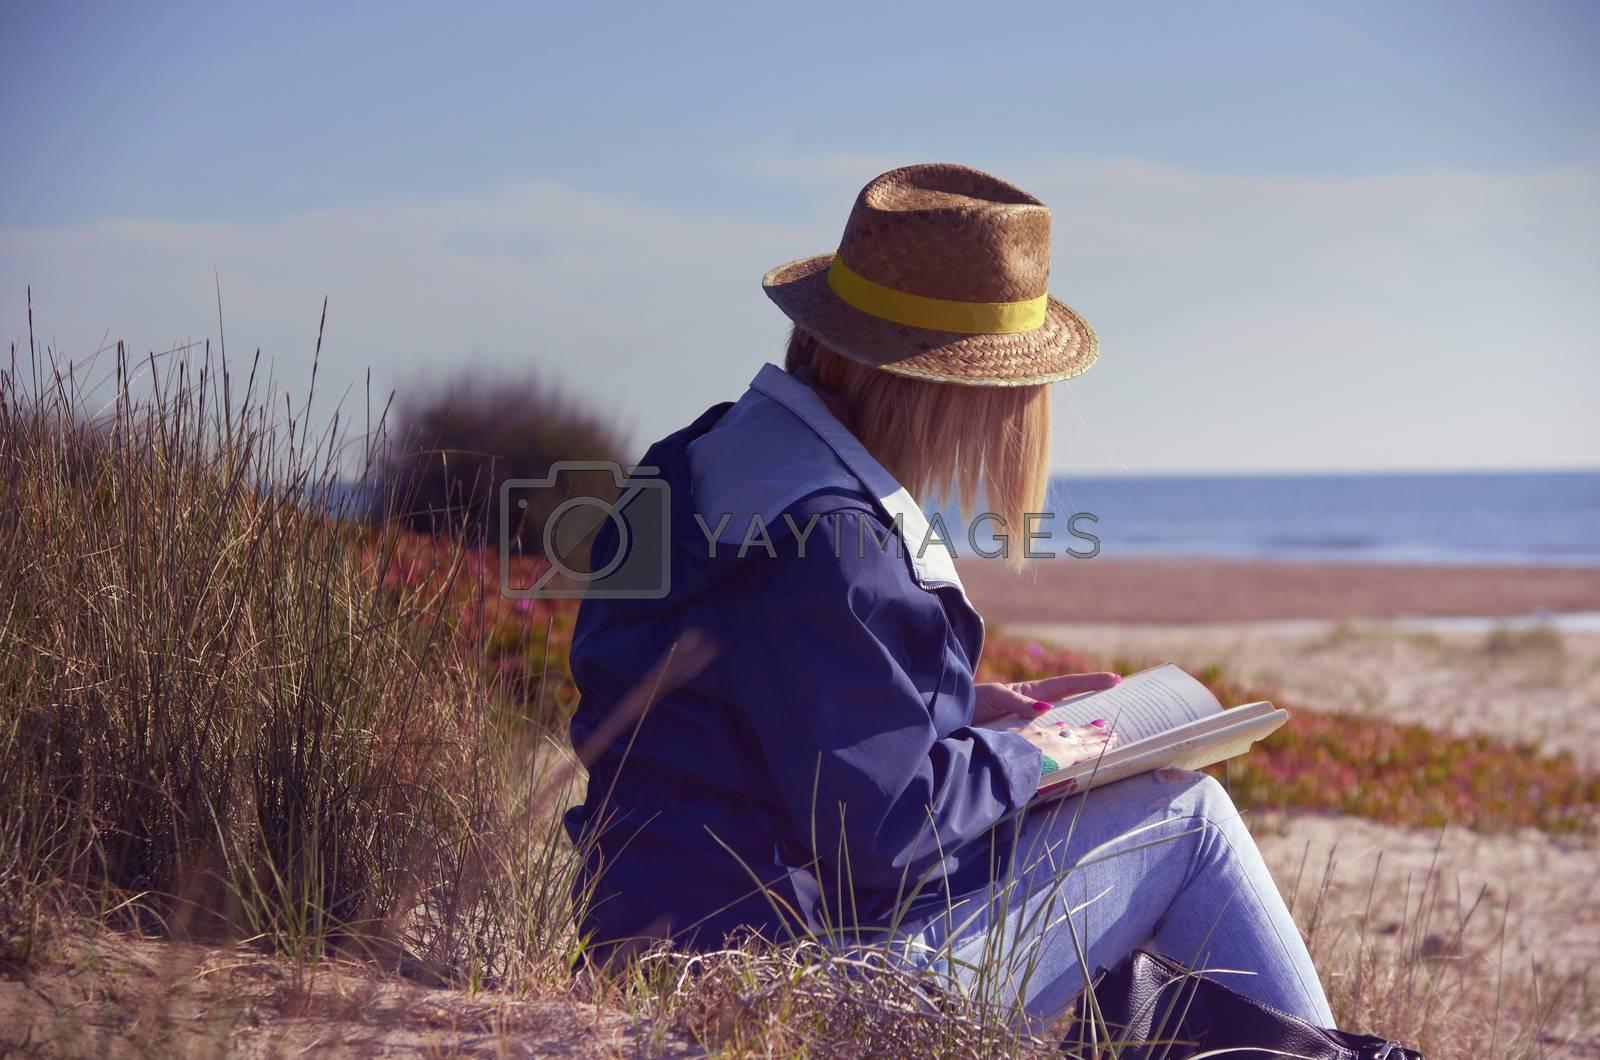 Sand, beach, sea, recreation by BPardoFotografia